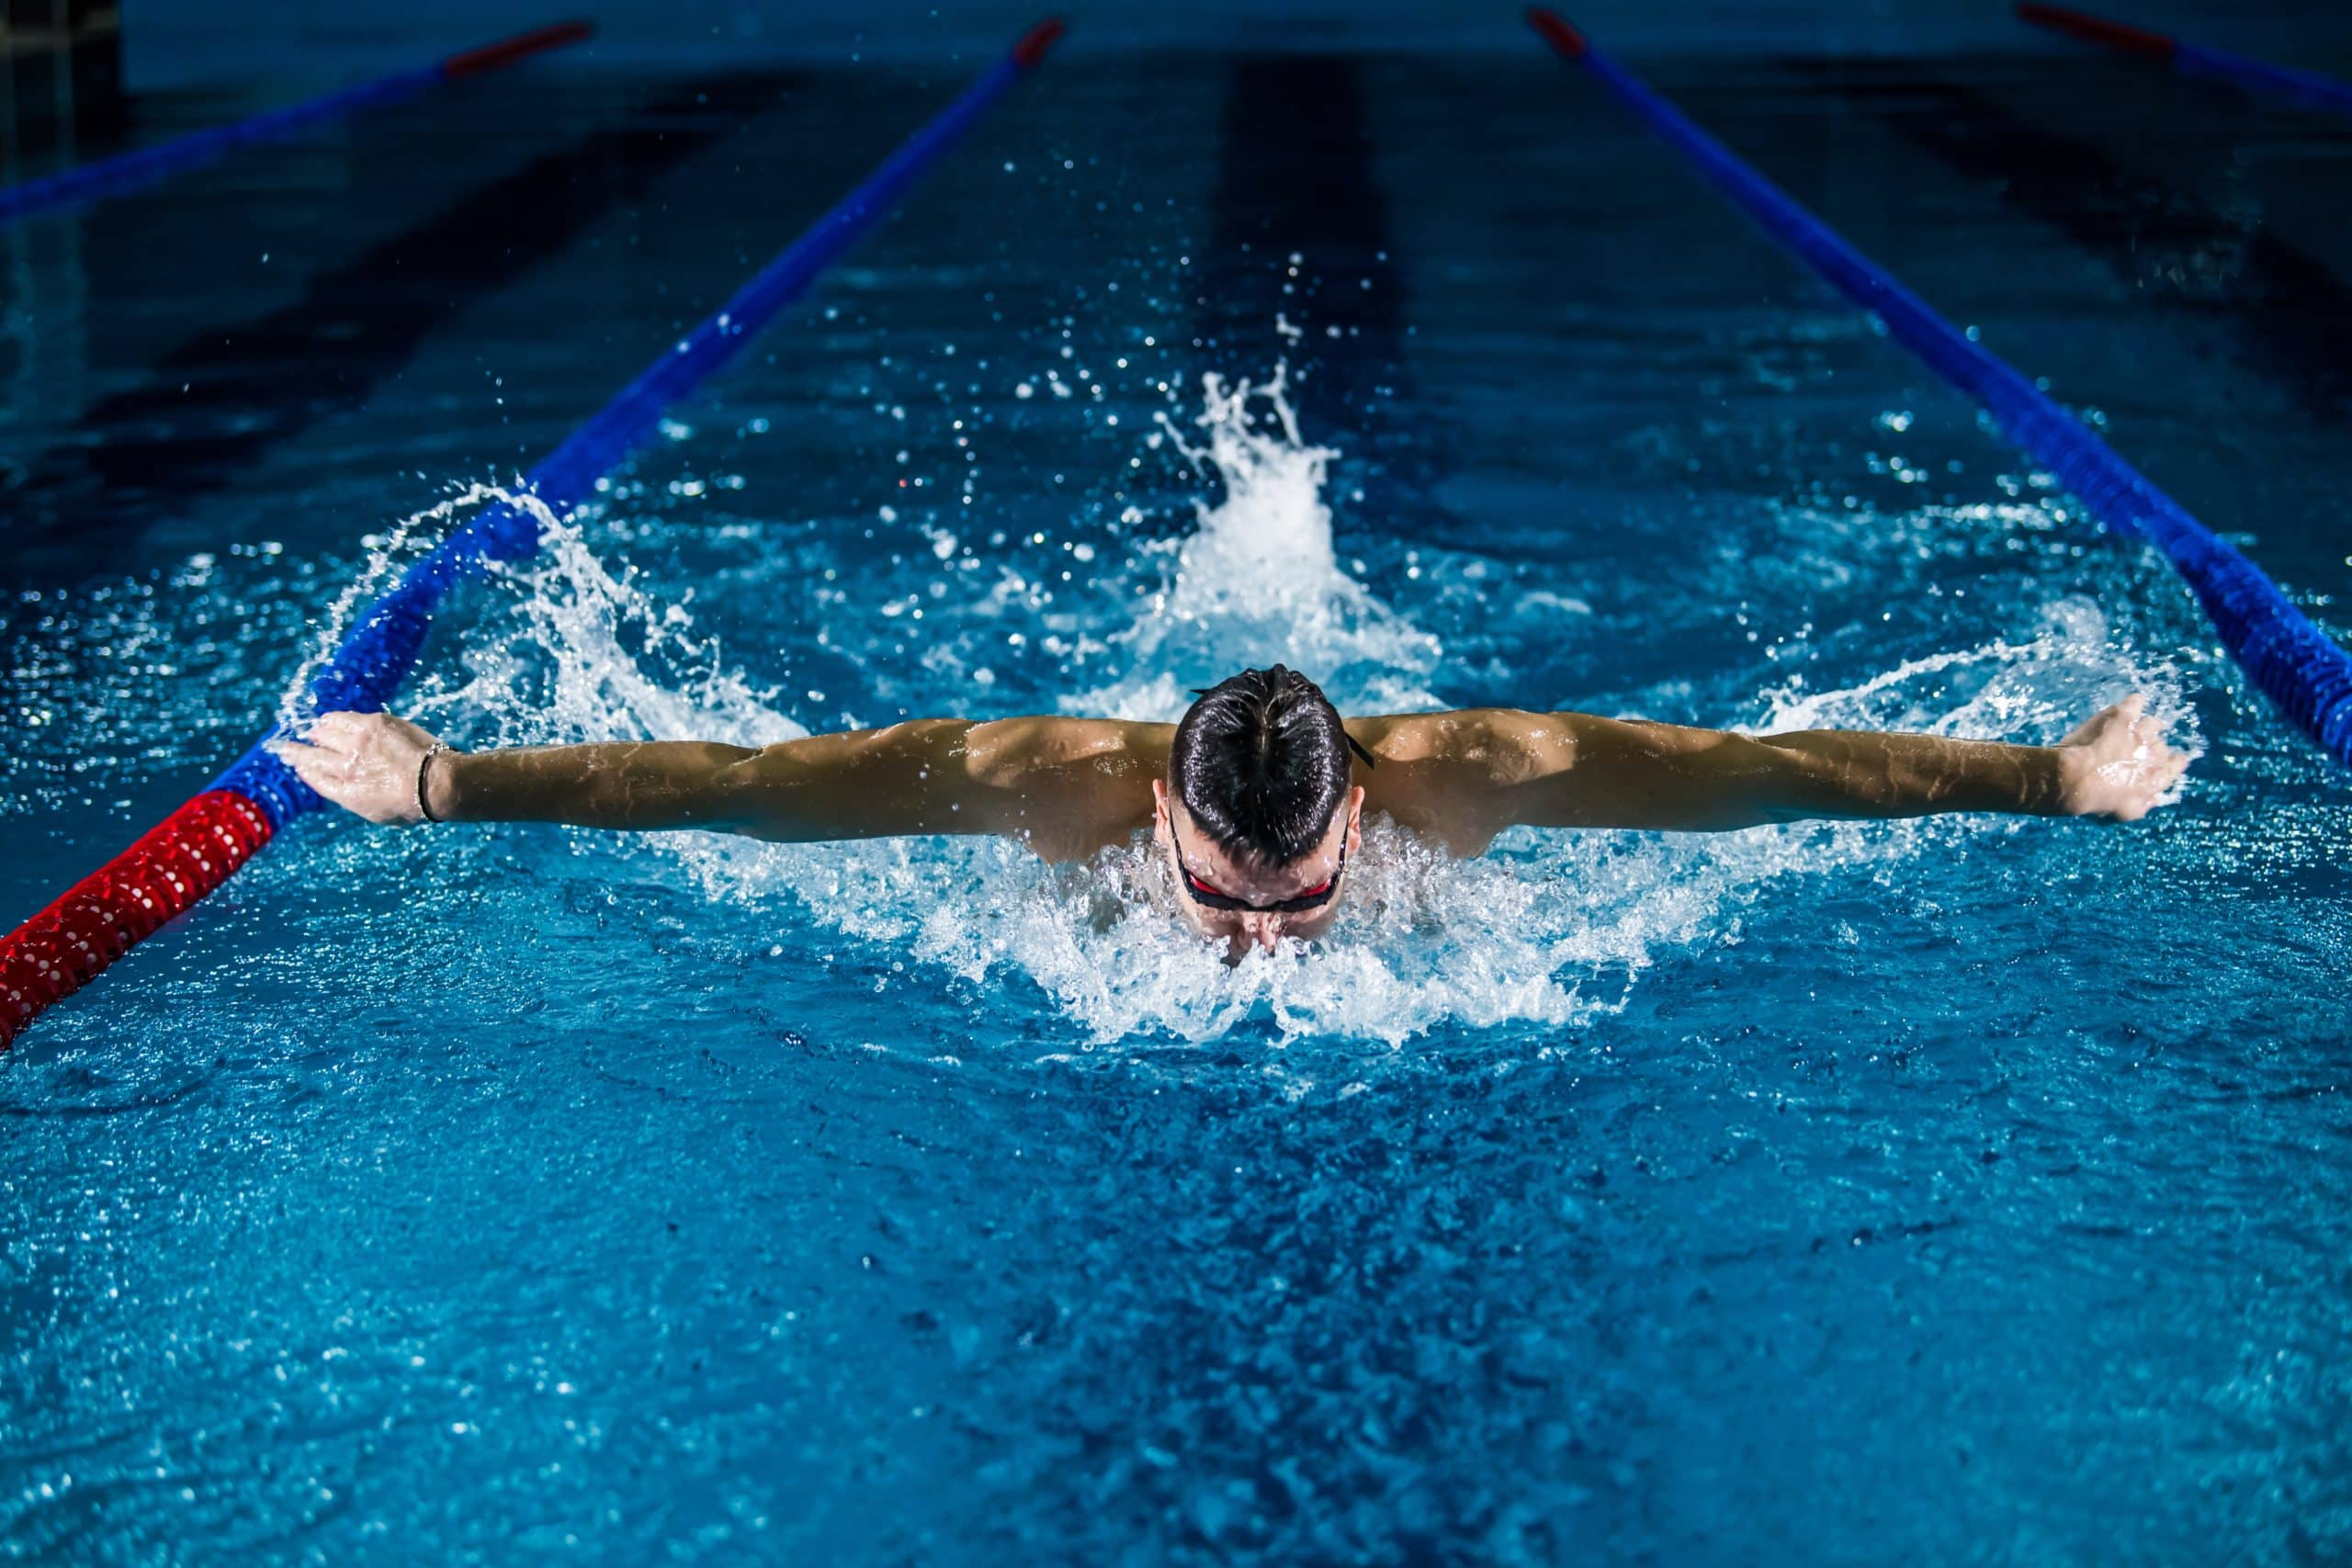 professional swimmer mid stroke in pool